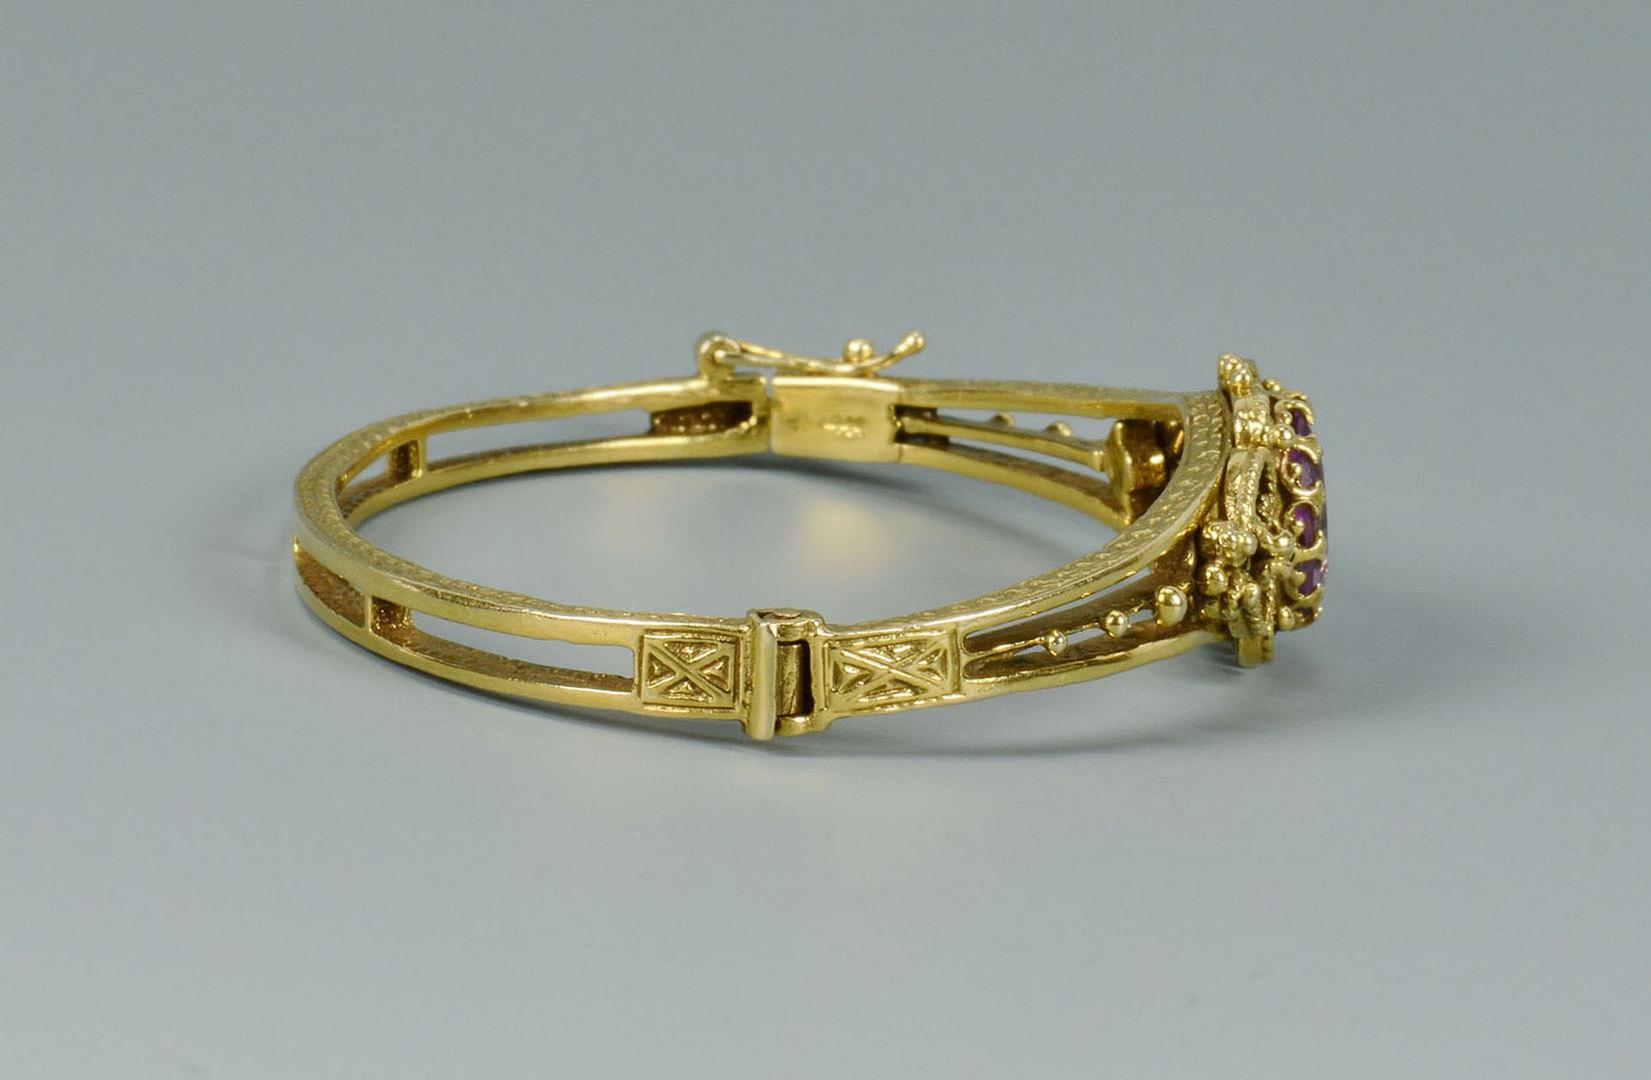 Lot 285: 14k Victorian-style Amethyst Bracelet